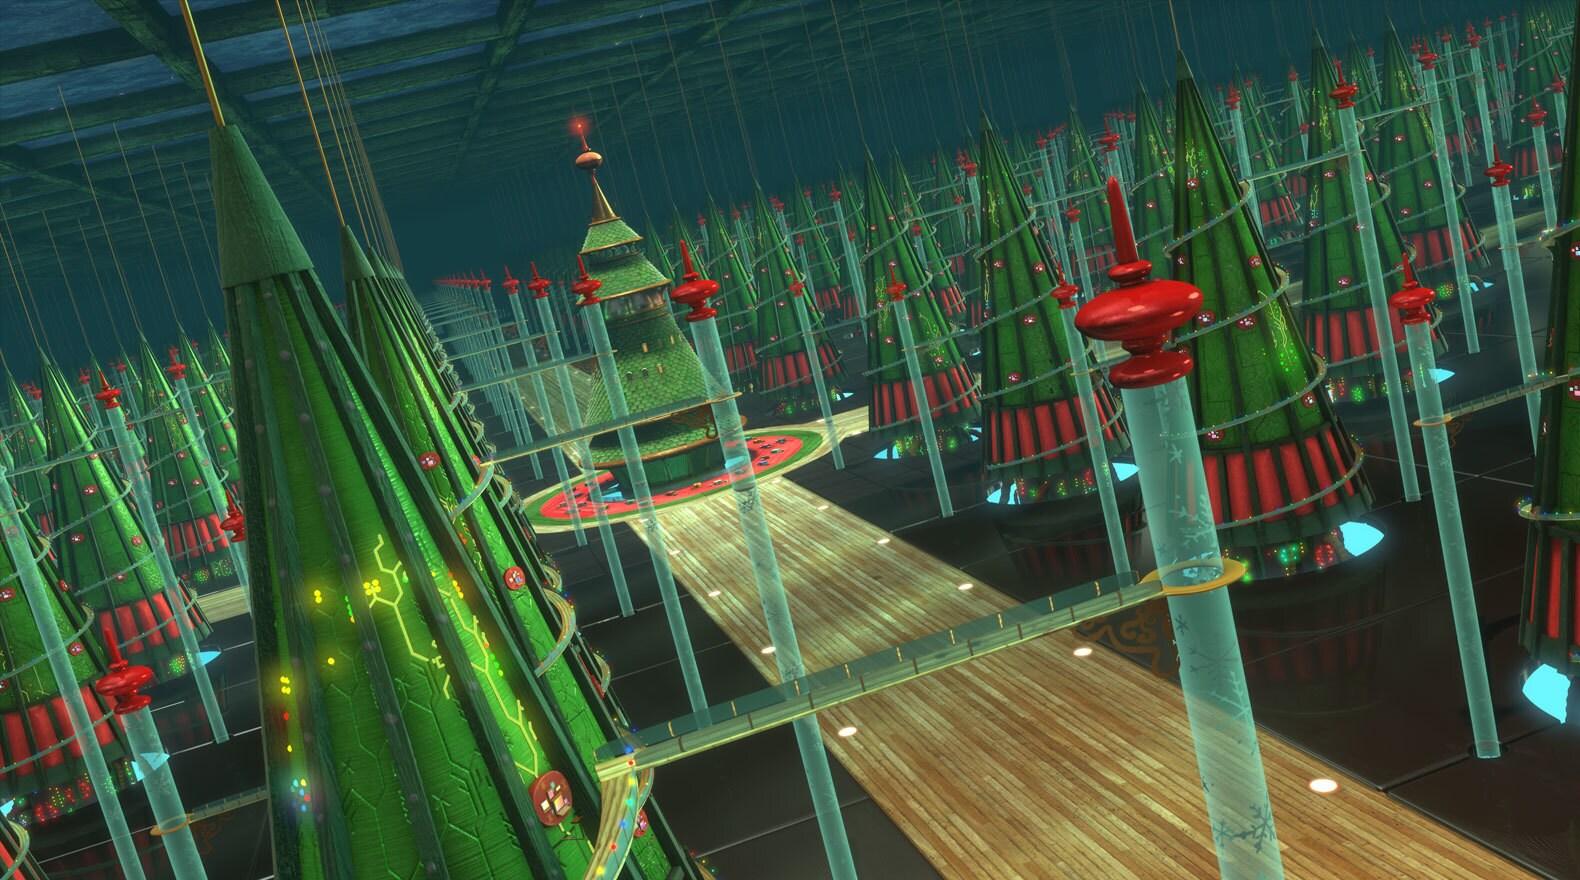 The brainchild of the brilliant Mr. Thistleton, the database tree farm is a sprawling underground...